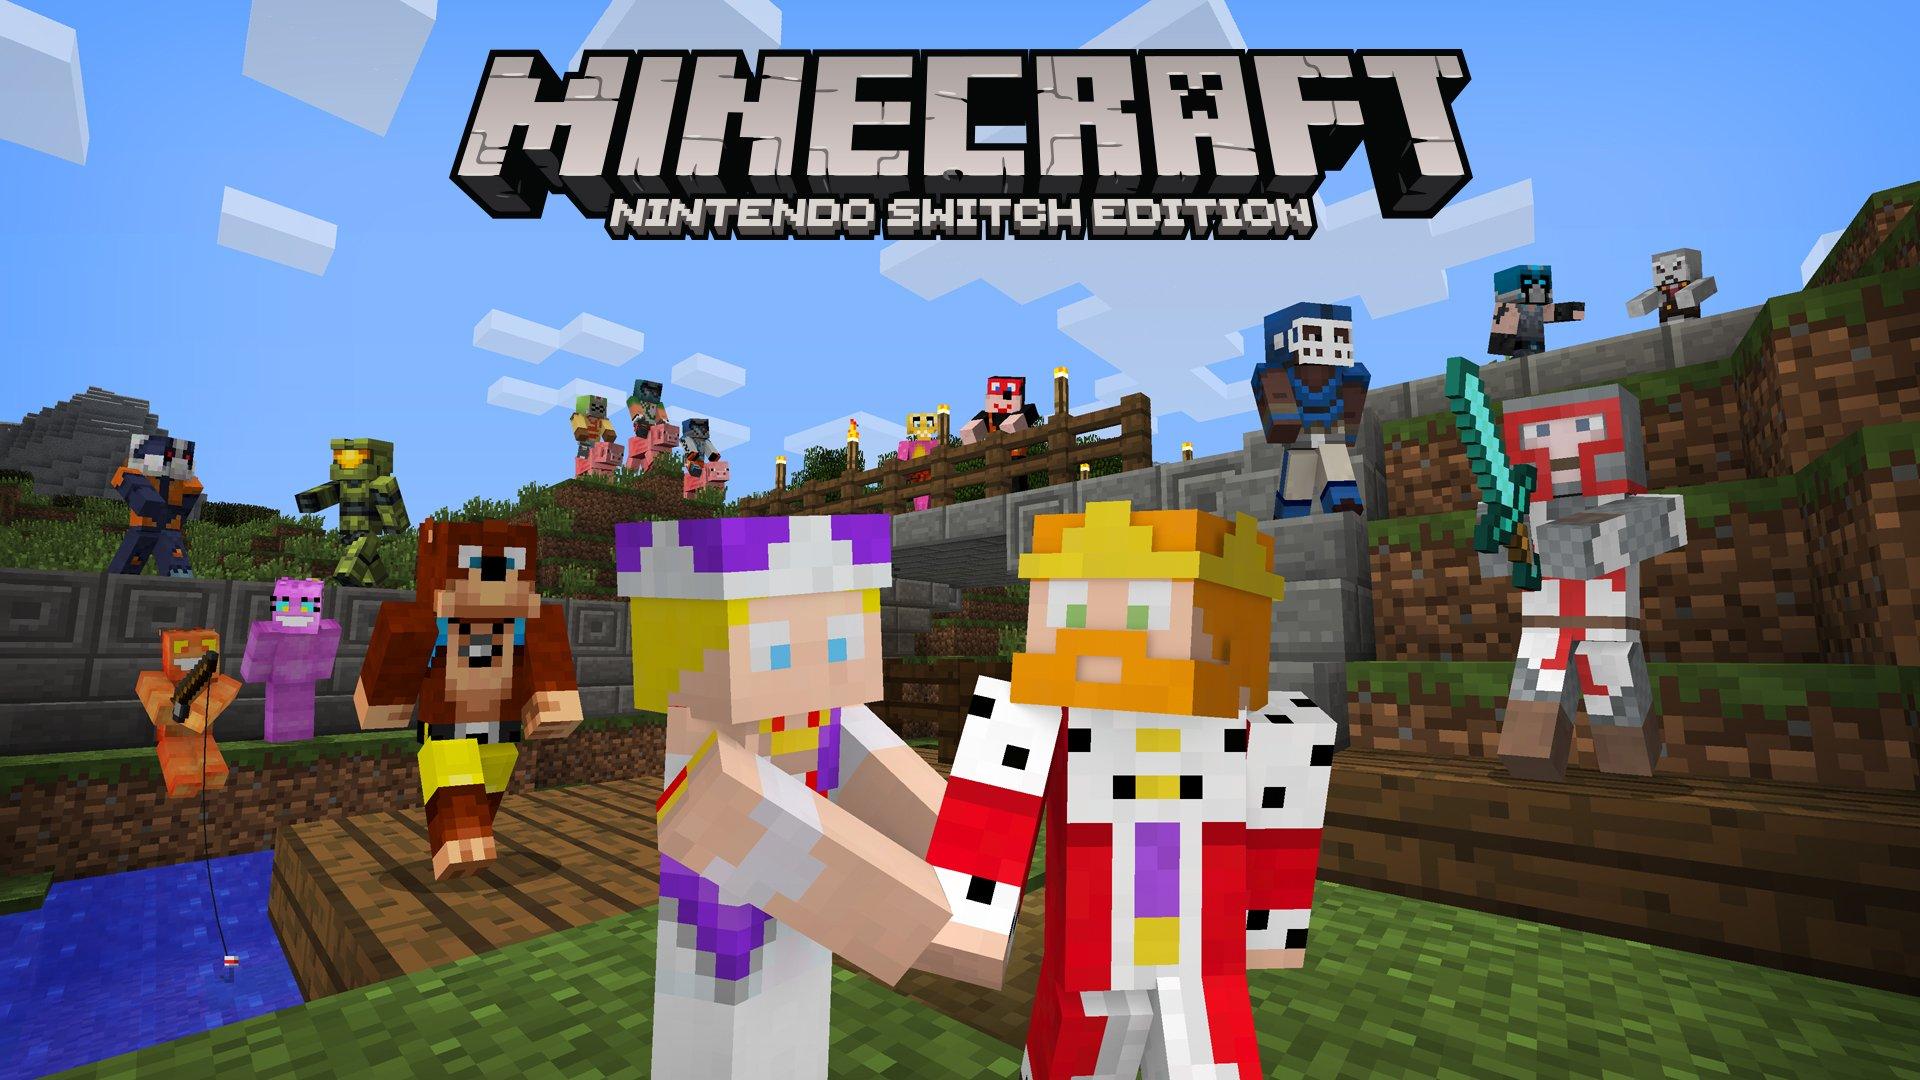 Minecraft Wii U And Switch Getting A Skin Pack Which Includes - Skins fur minecraft wii u